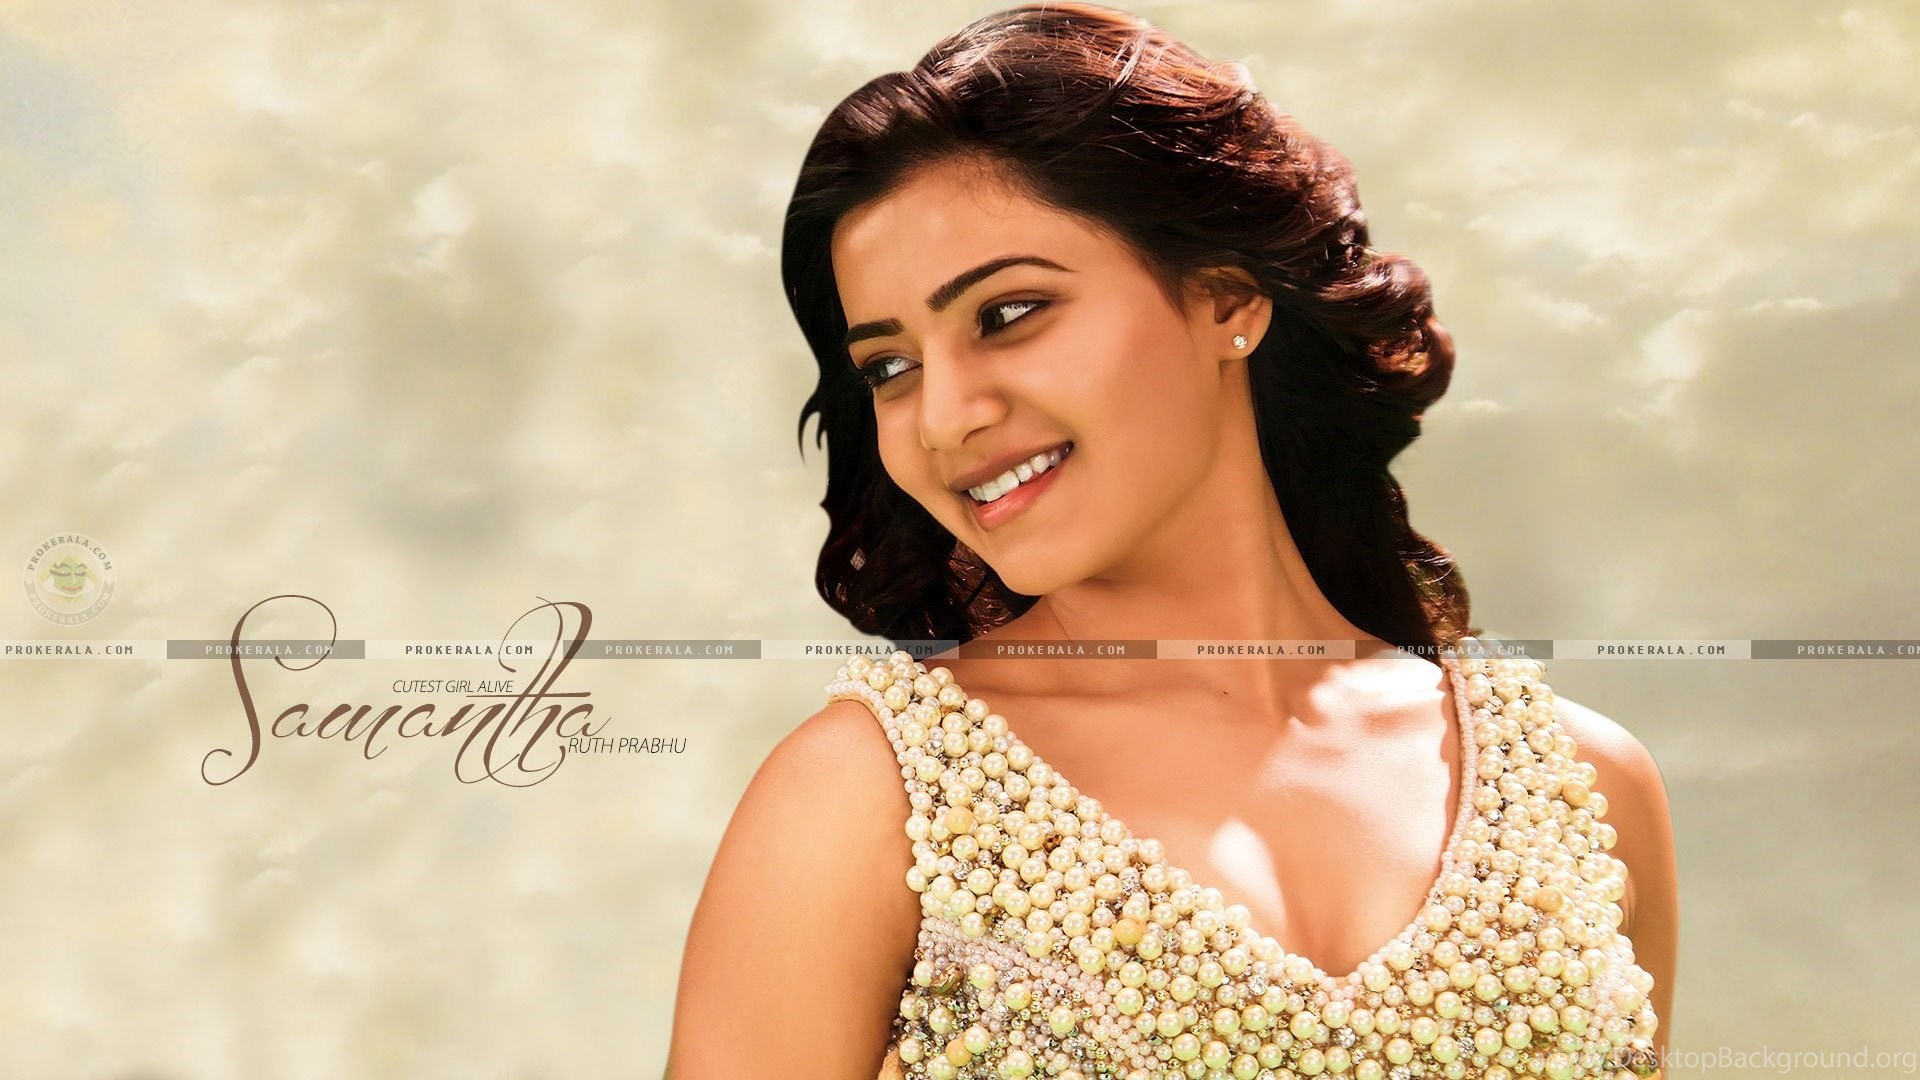 Samantha Naga Chaitanya Photos Ye Maya Chesave , HD Wallpaper & Backgrounds